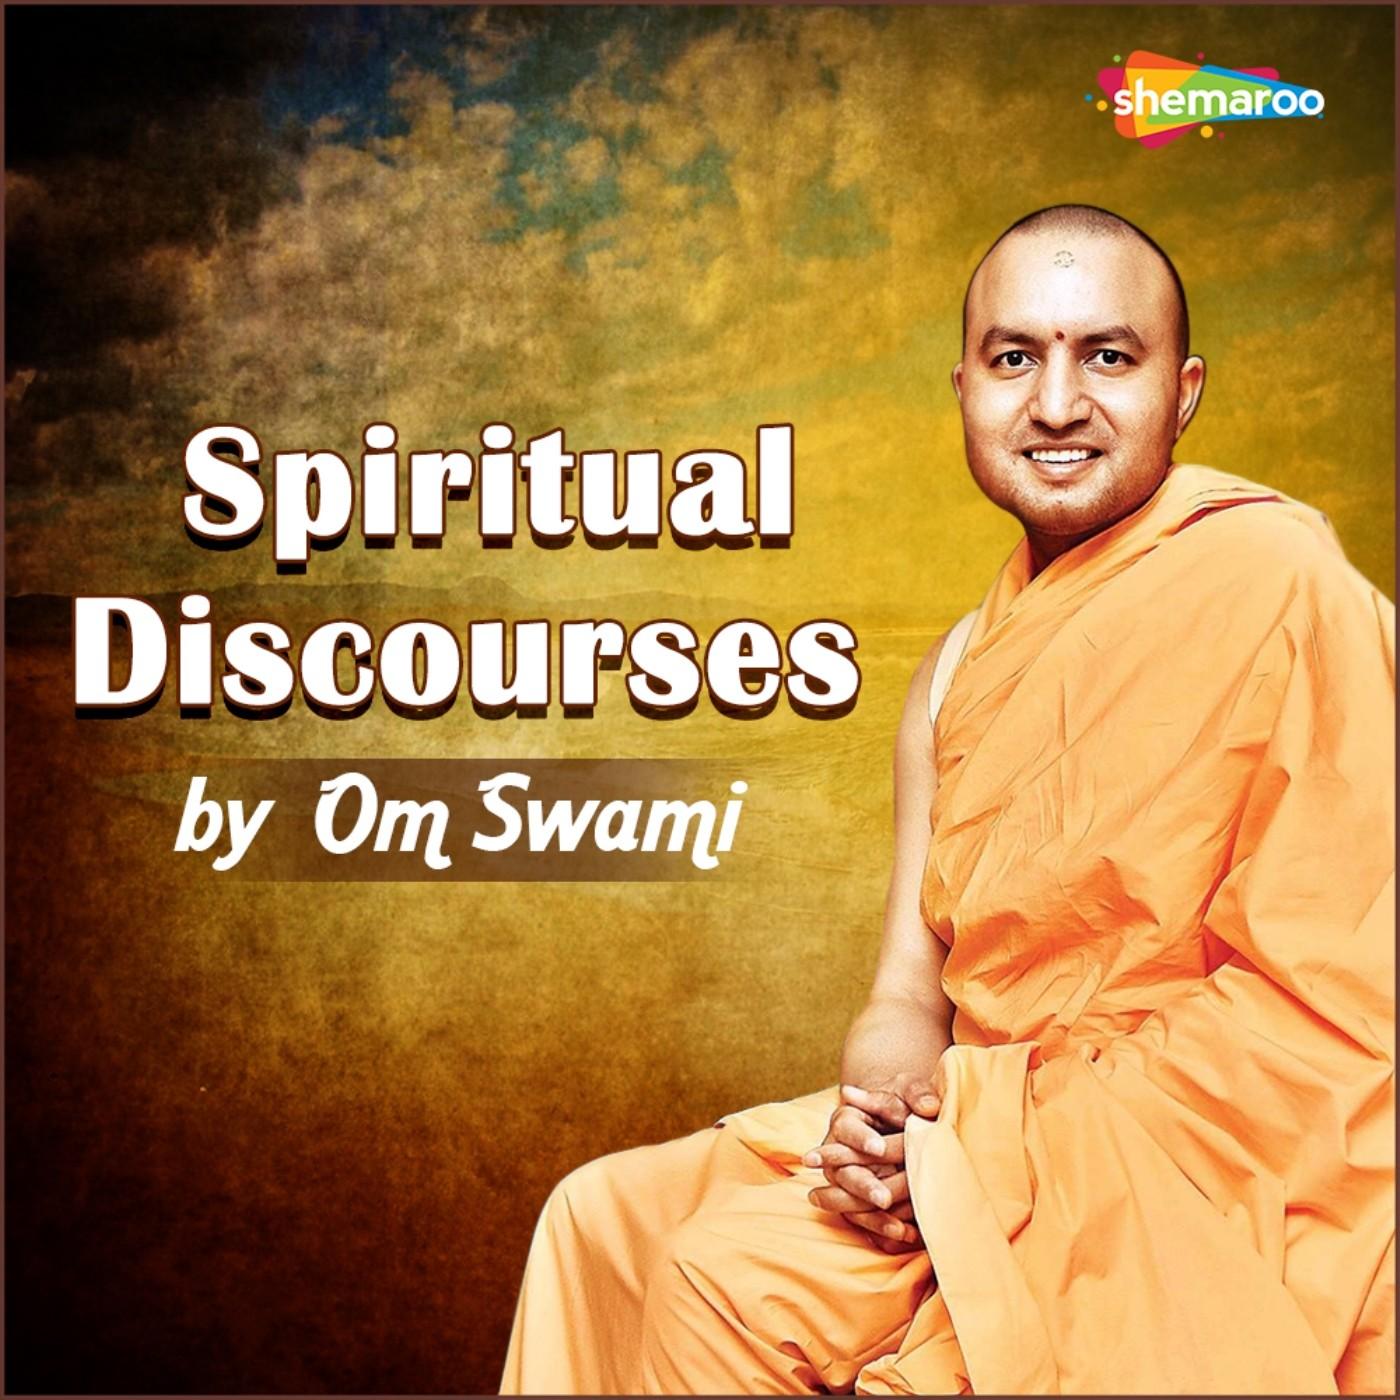 Spiritual Discourses by Om Swami |